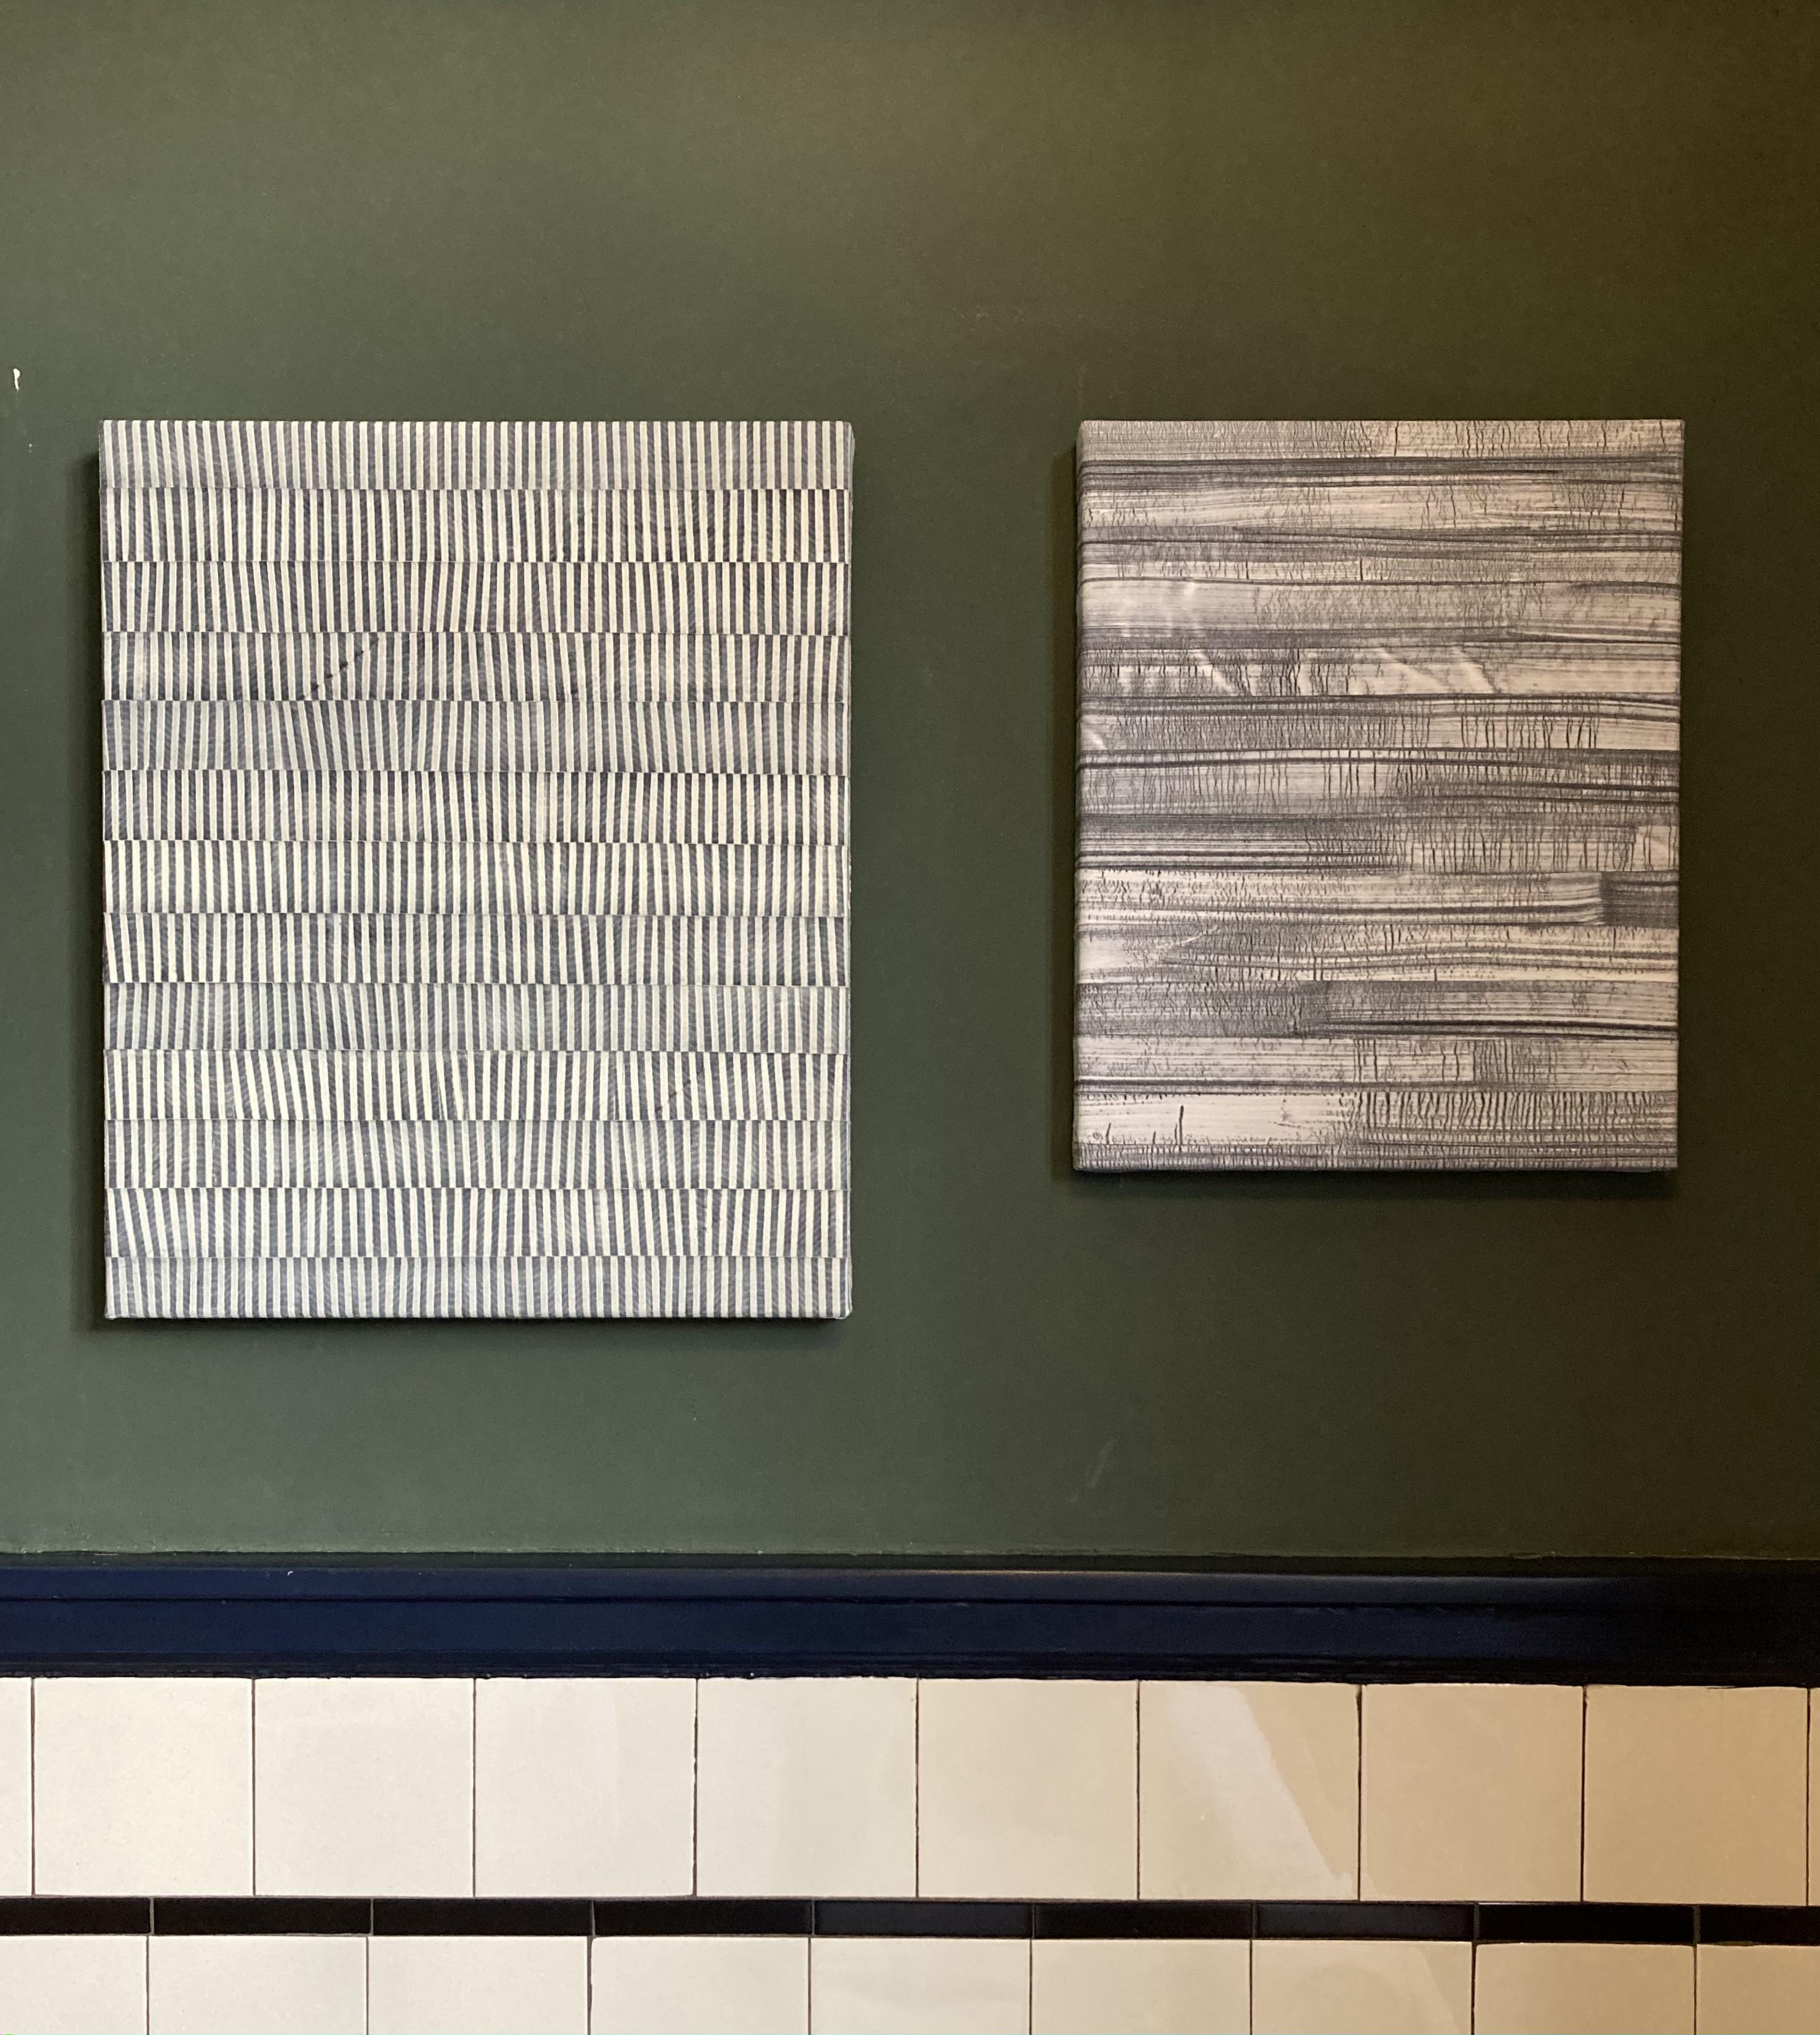 Exhibition at Restaurant Foer, Amsterdam